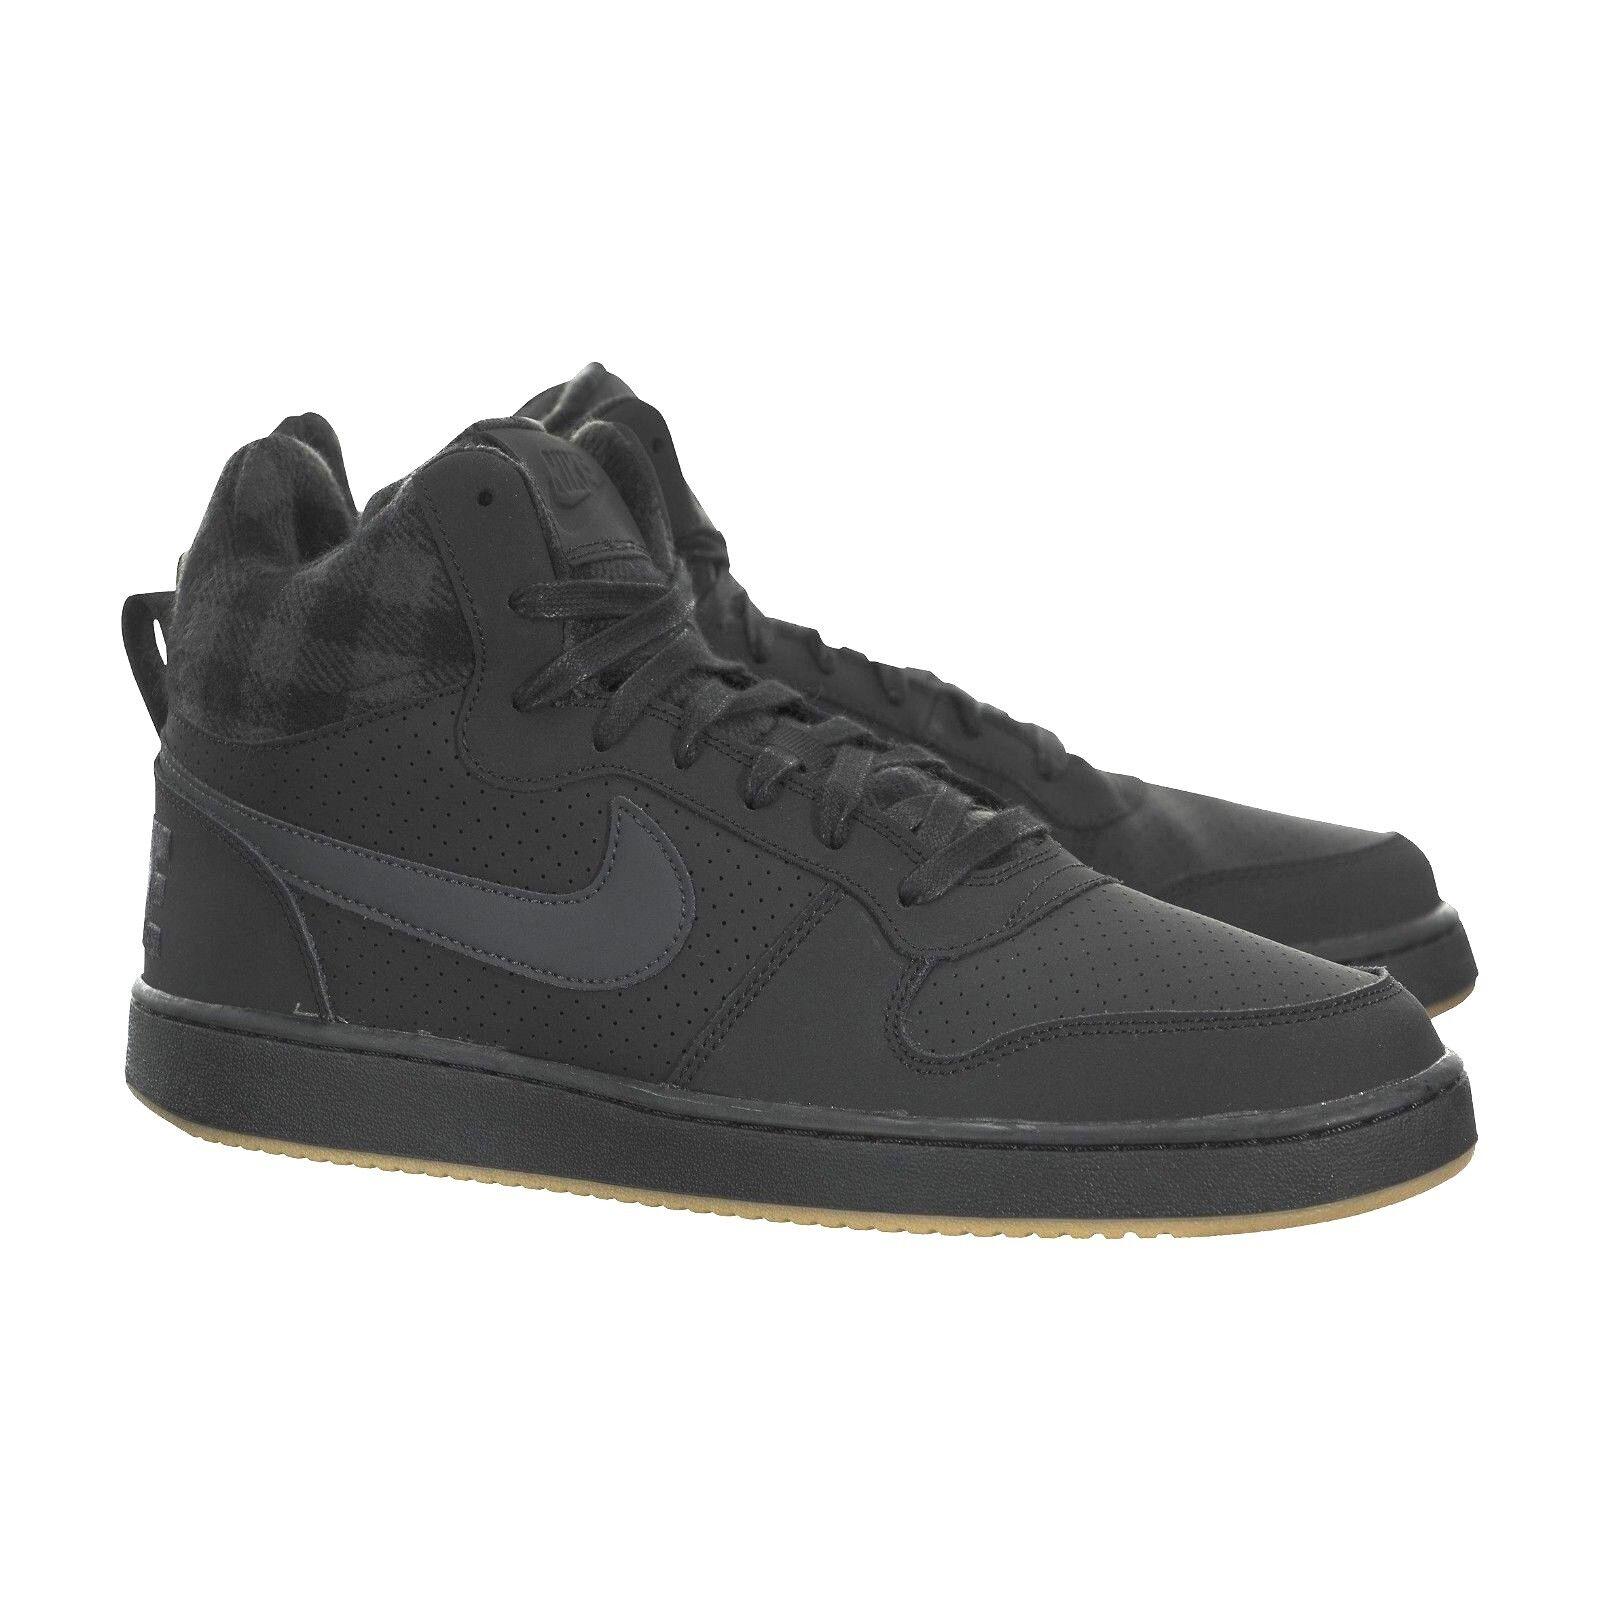 Nike Court Mens Burrough Mid Premium Black/Anthracite-Gum Mens Court Shoes 844884 002 f28886